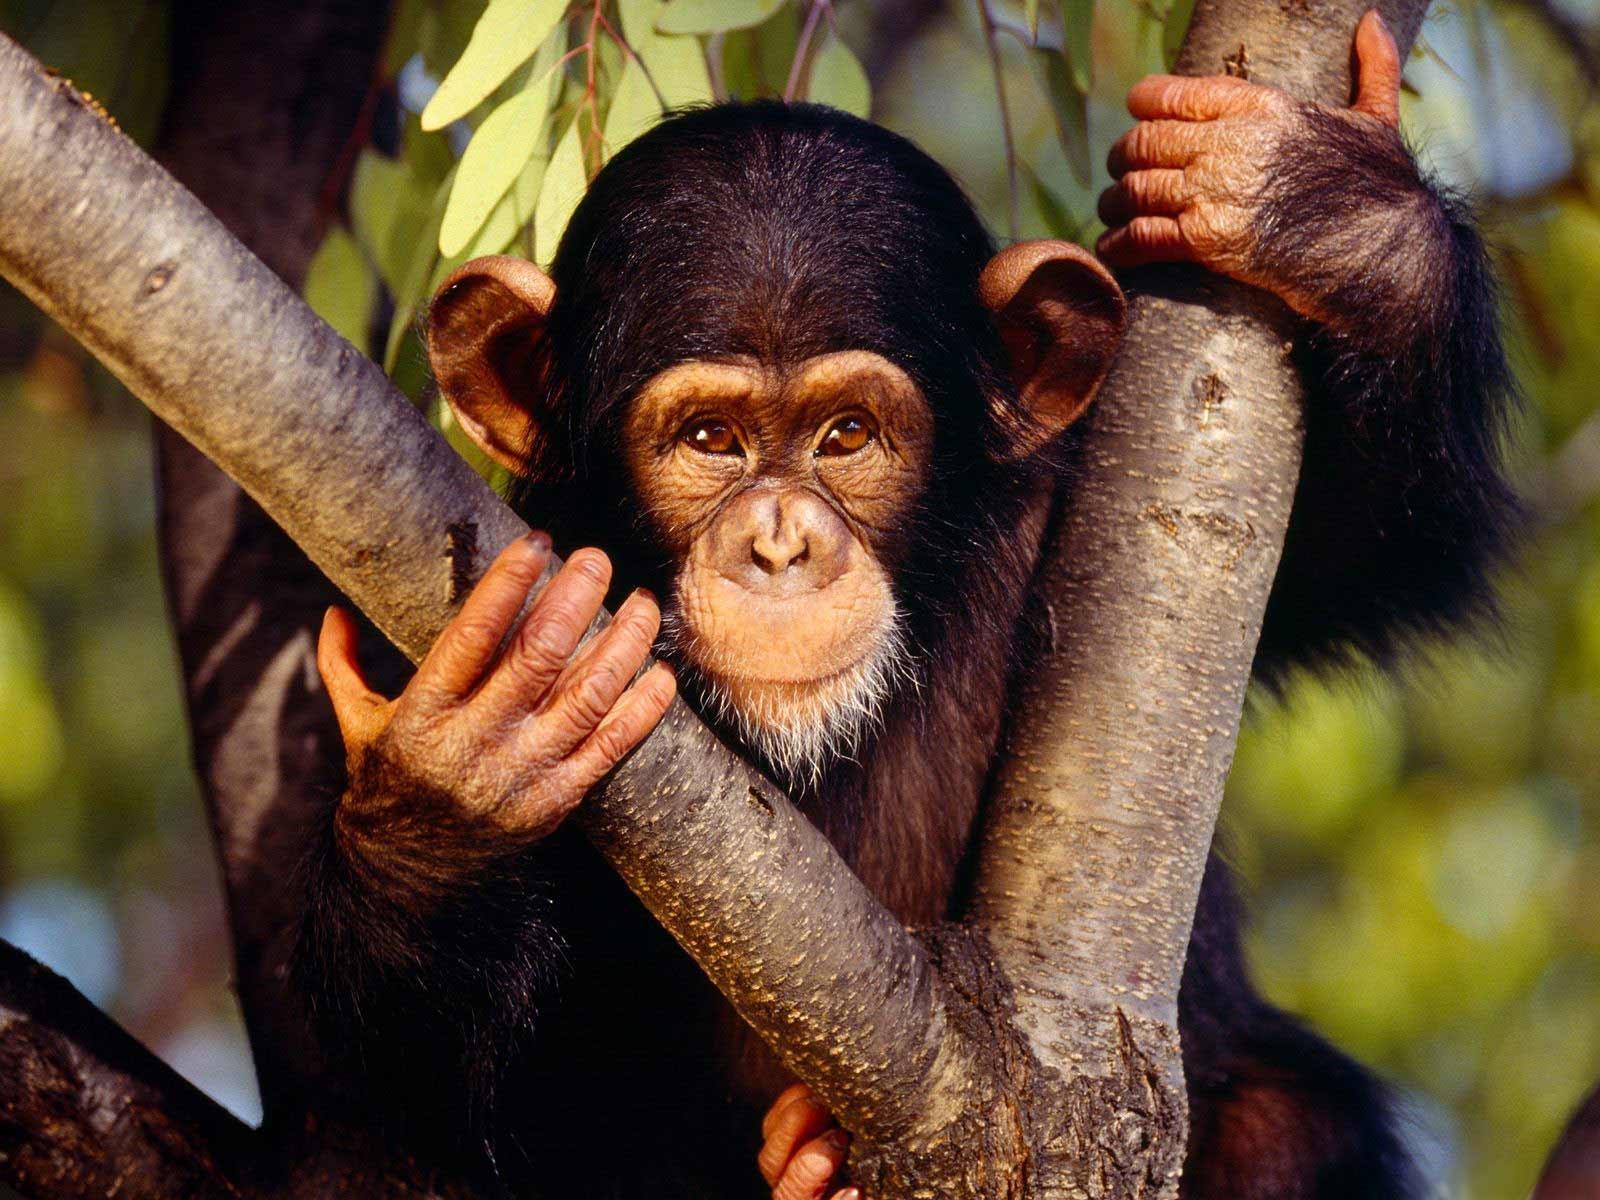 http://2.bp.blogspot.com/-3qzBUf6yoGc/UBkl9PCfirI/AAAAAAAAFZU/NtRebKDgVrA/s1600/Chimpanzees+wallpapers+7.jpg